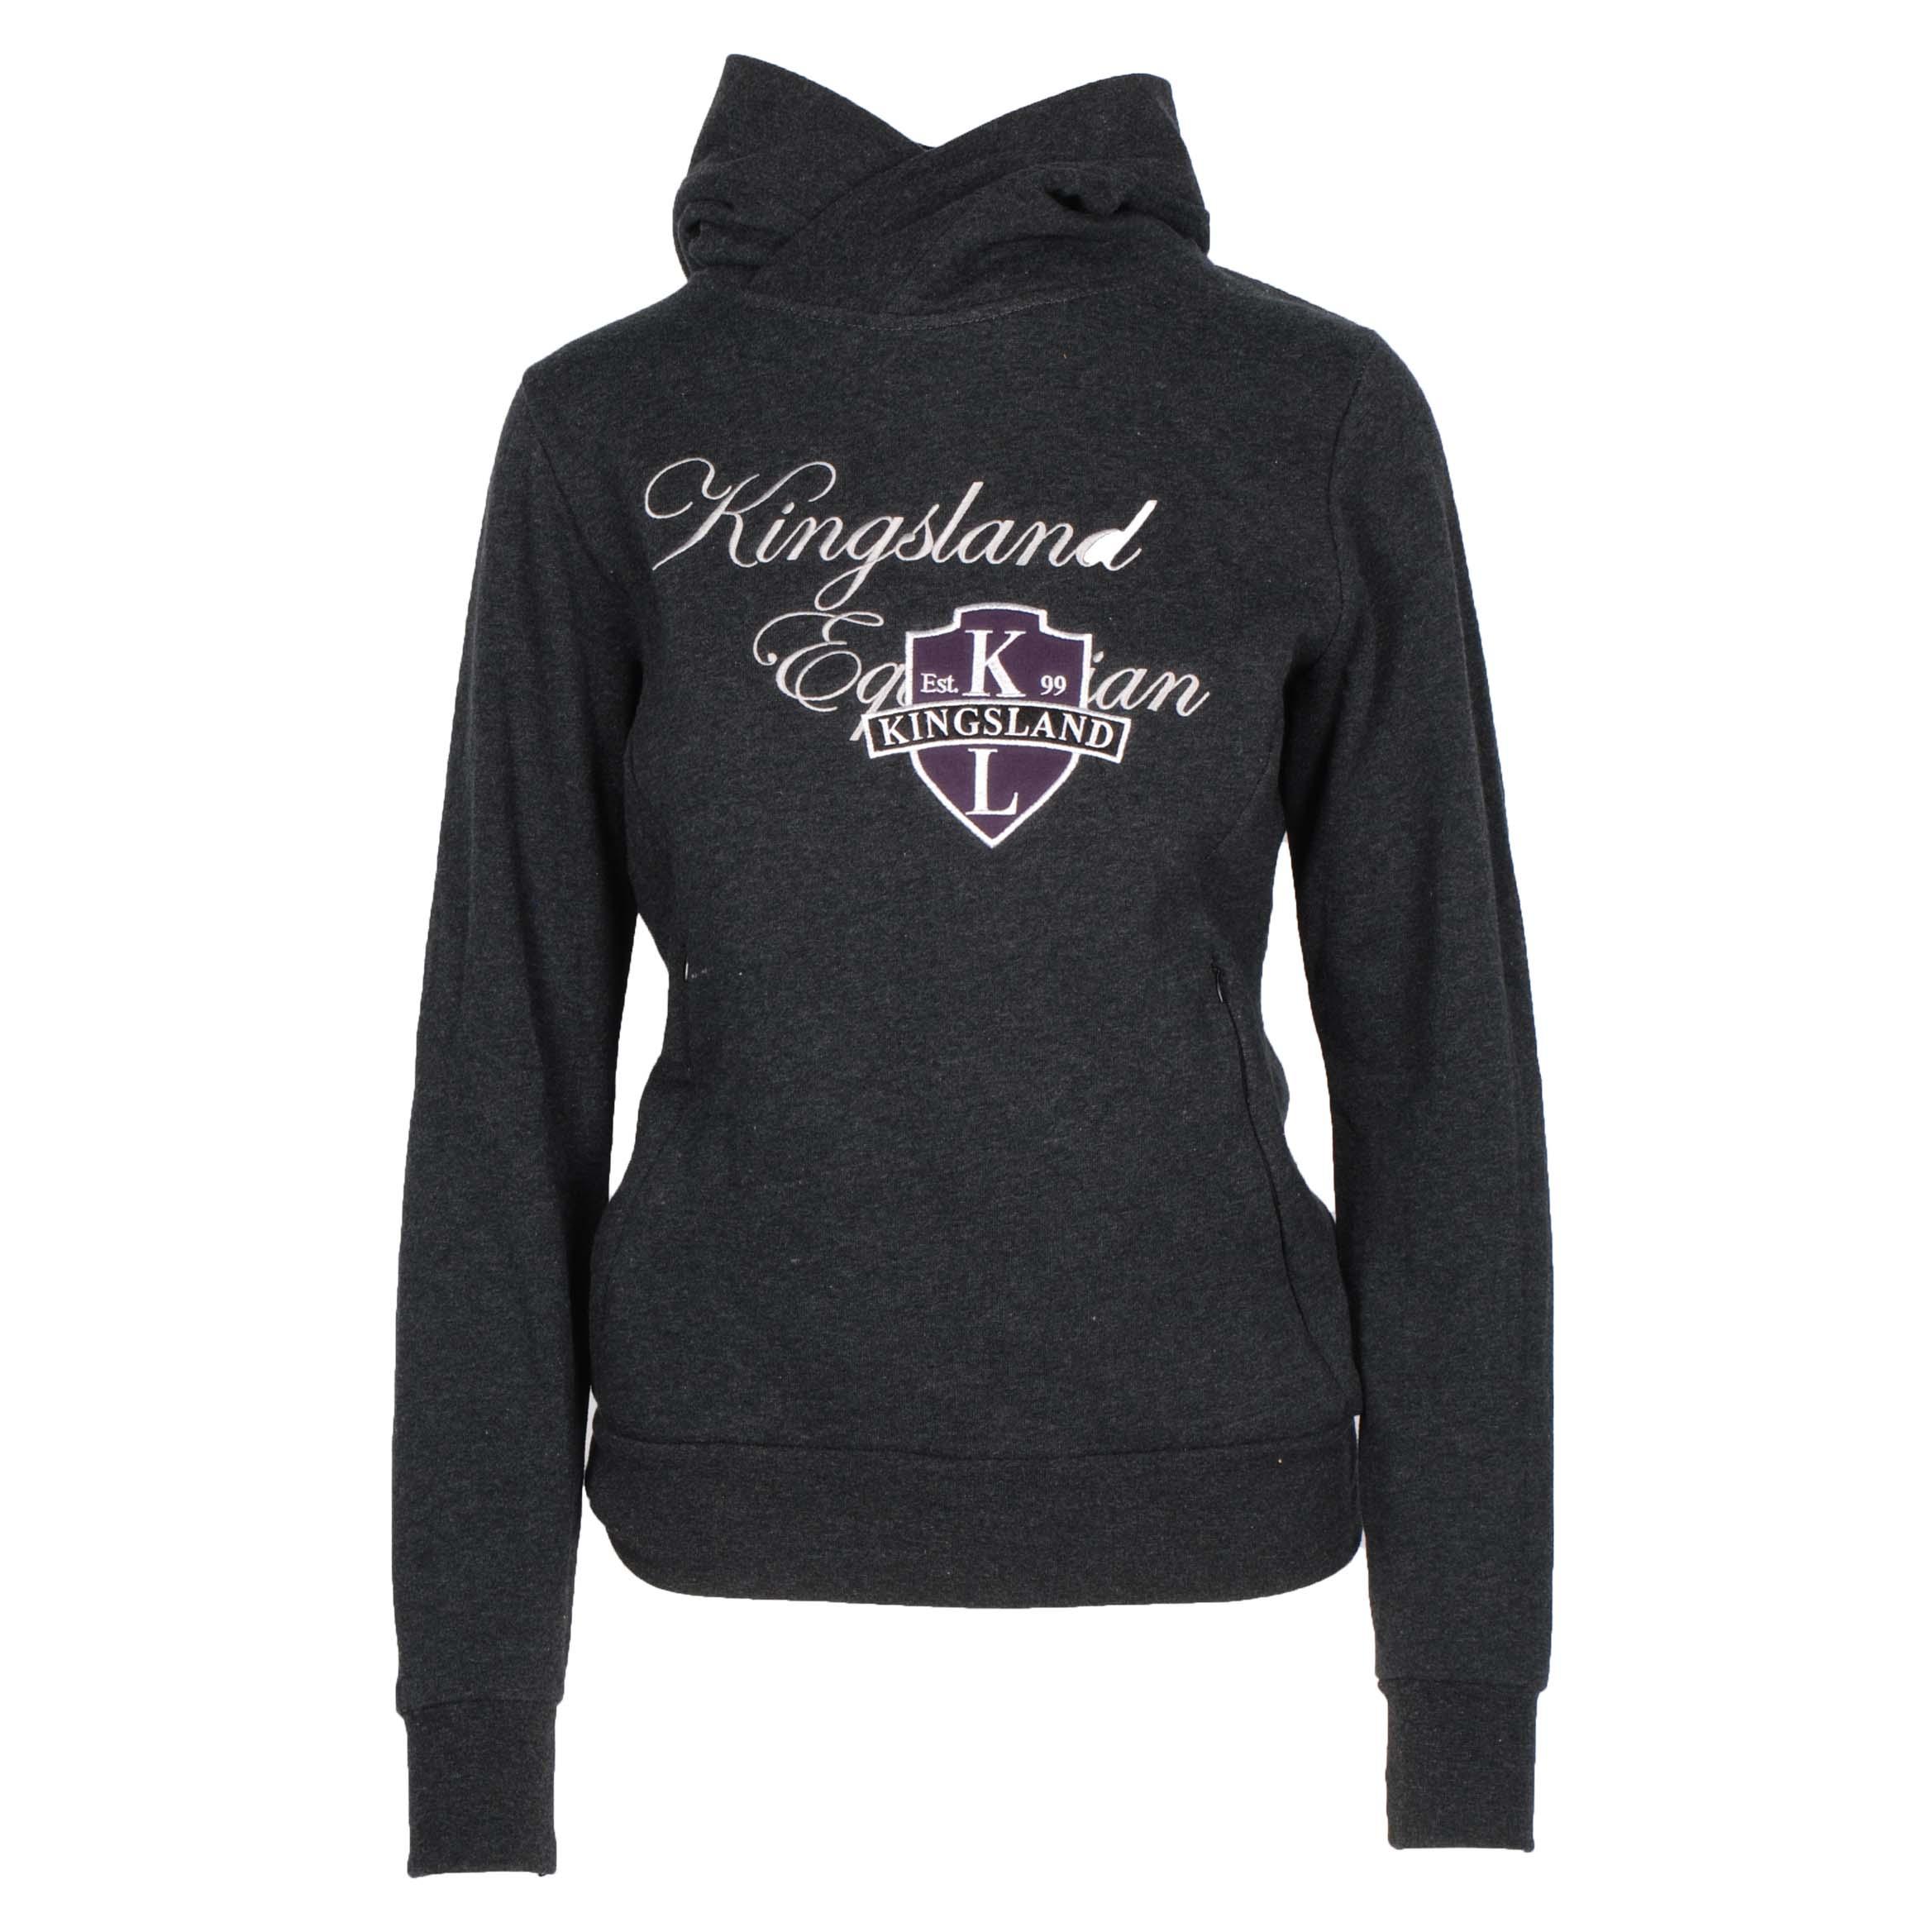 Kingsland Deanna sweater donkergrijs maat:xs